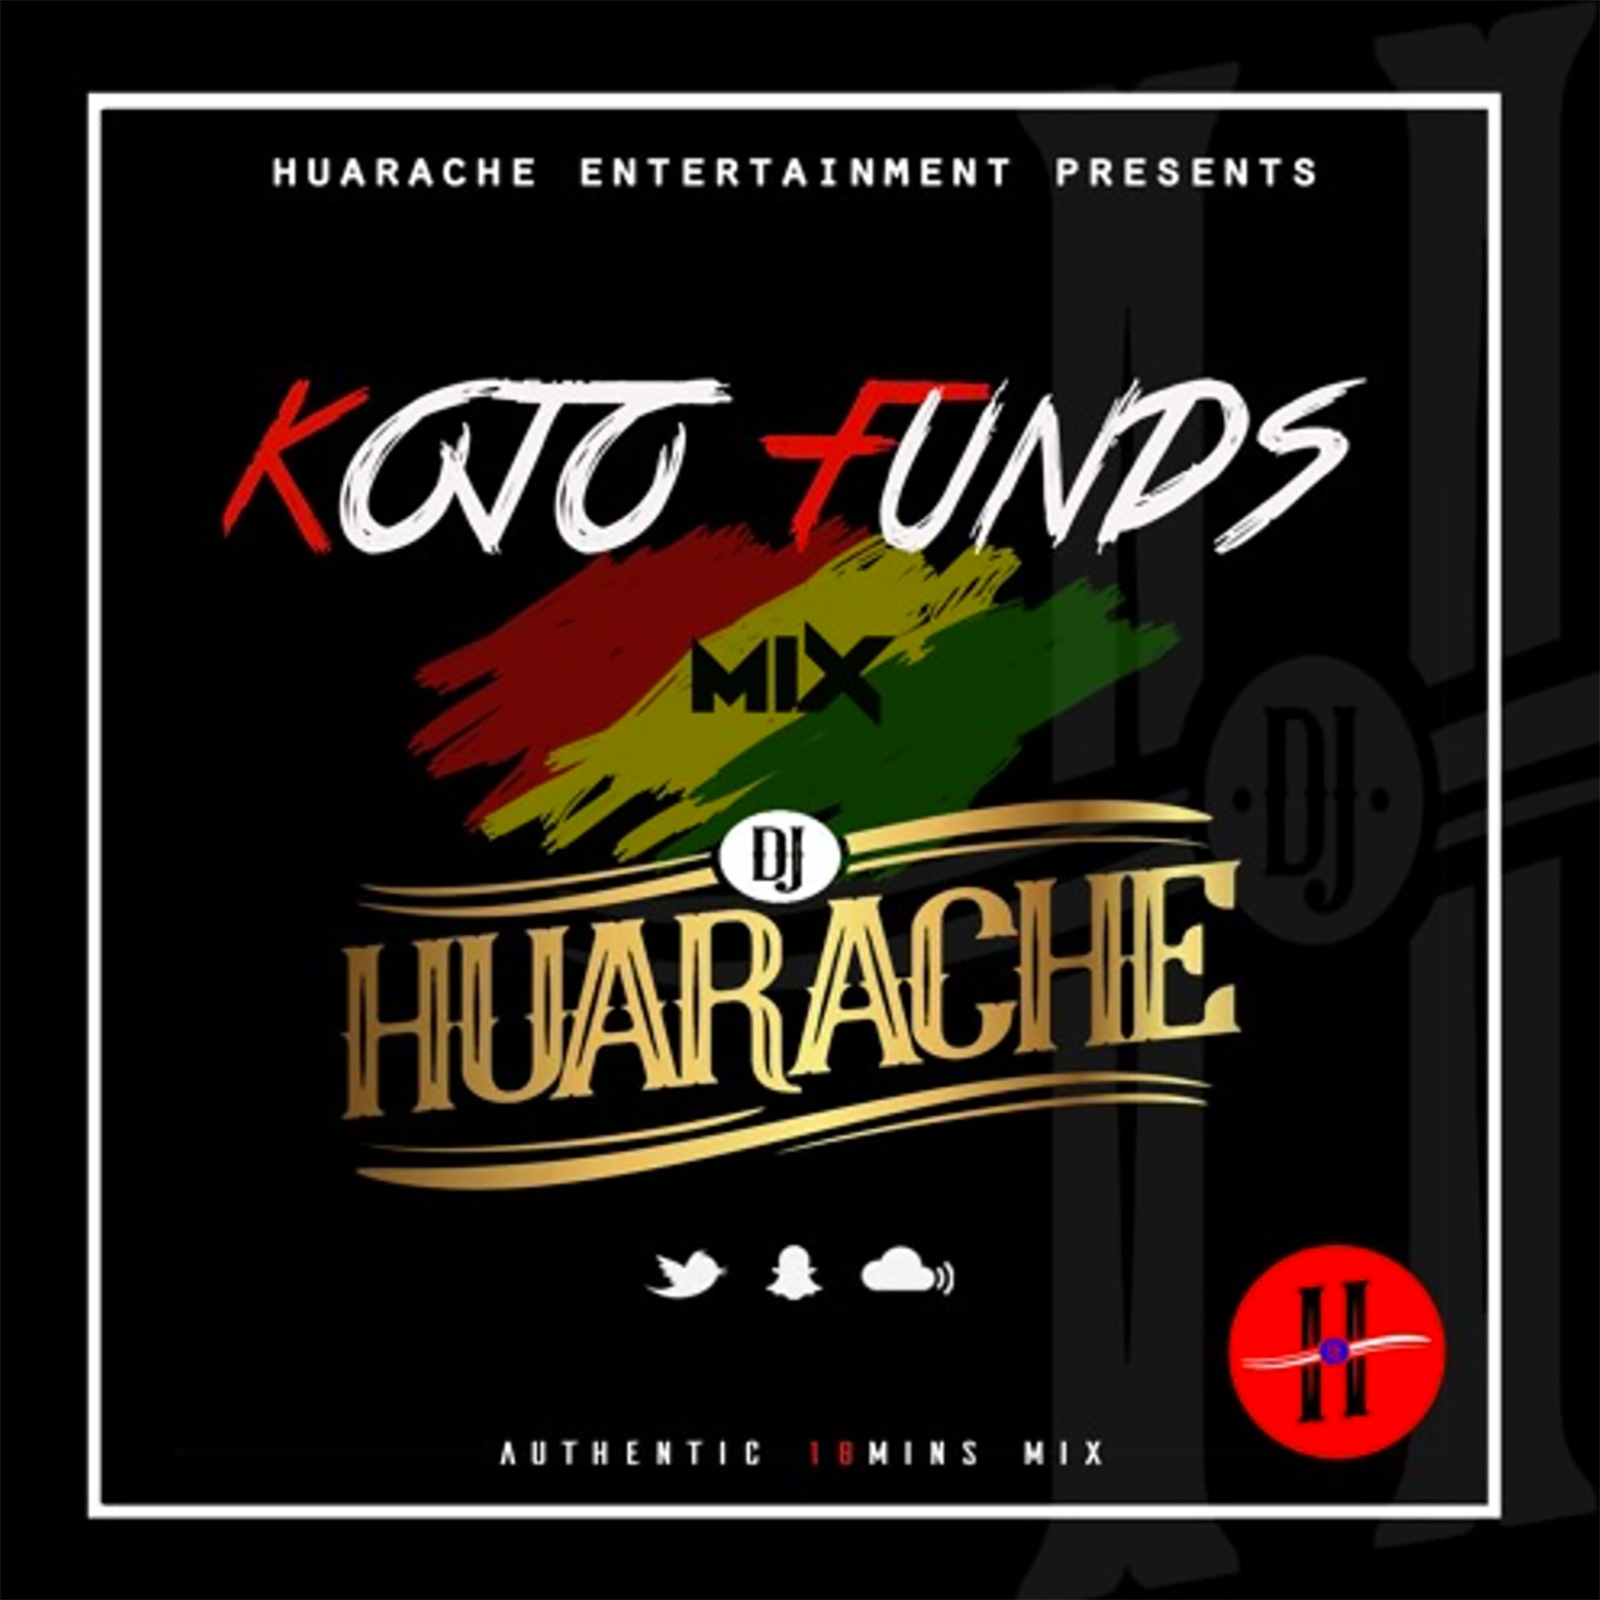 Kojo Funds Mix by DJ Huarache